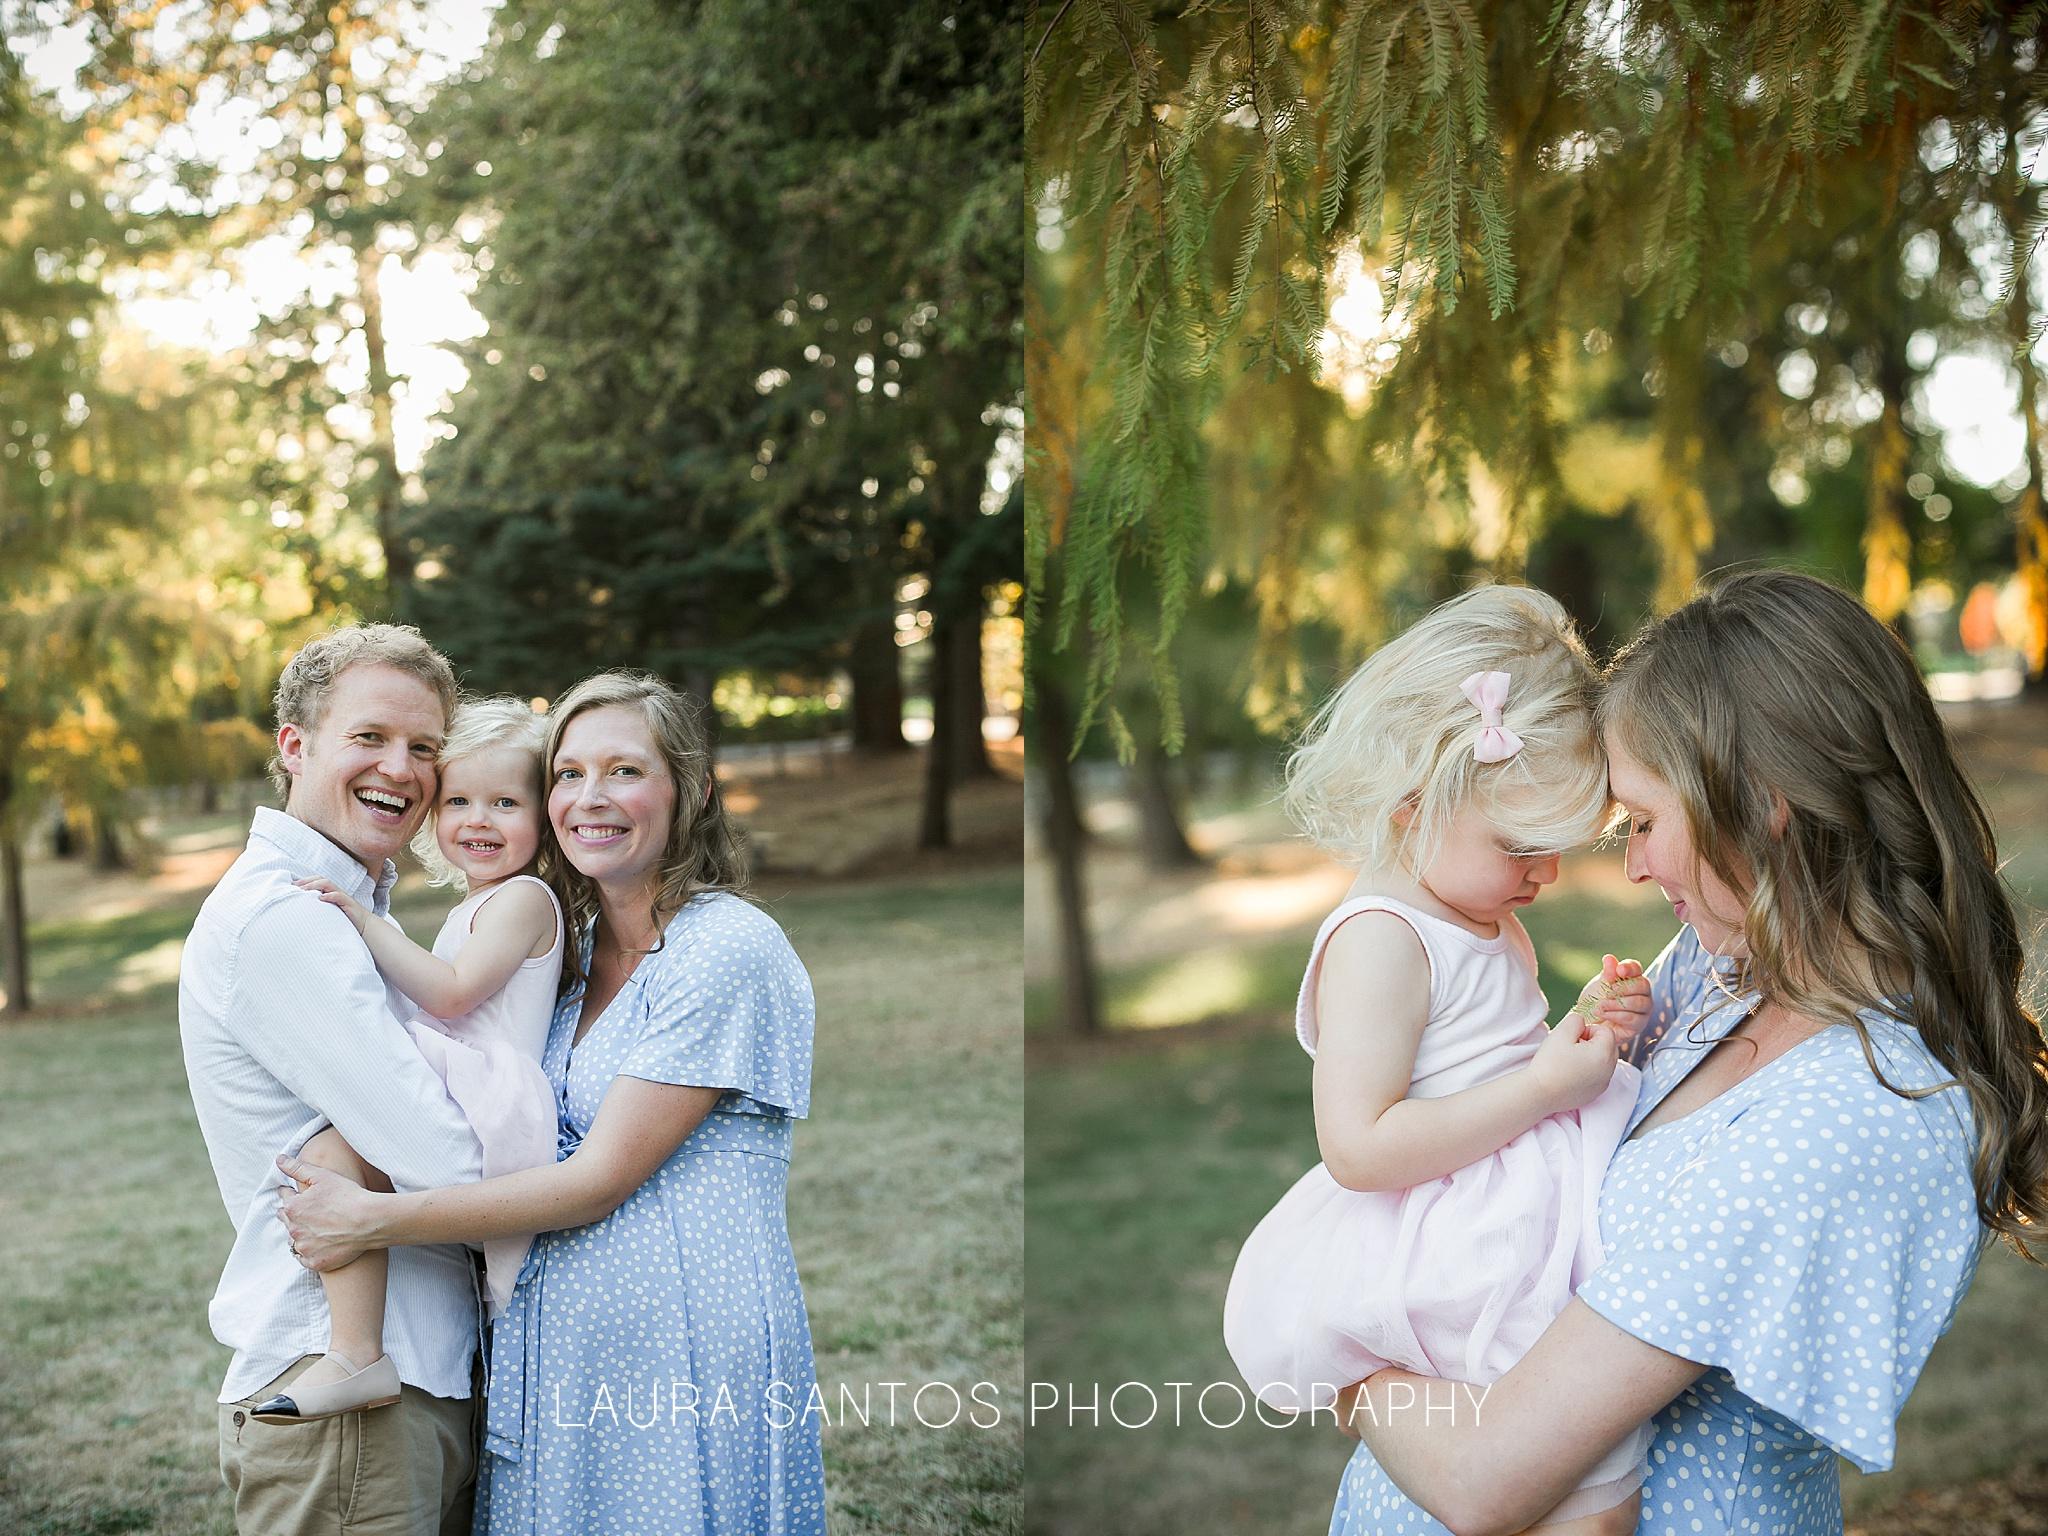 Laura Santos Photography Portland Oregon Family Photographer_0723.jpg